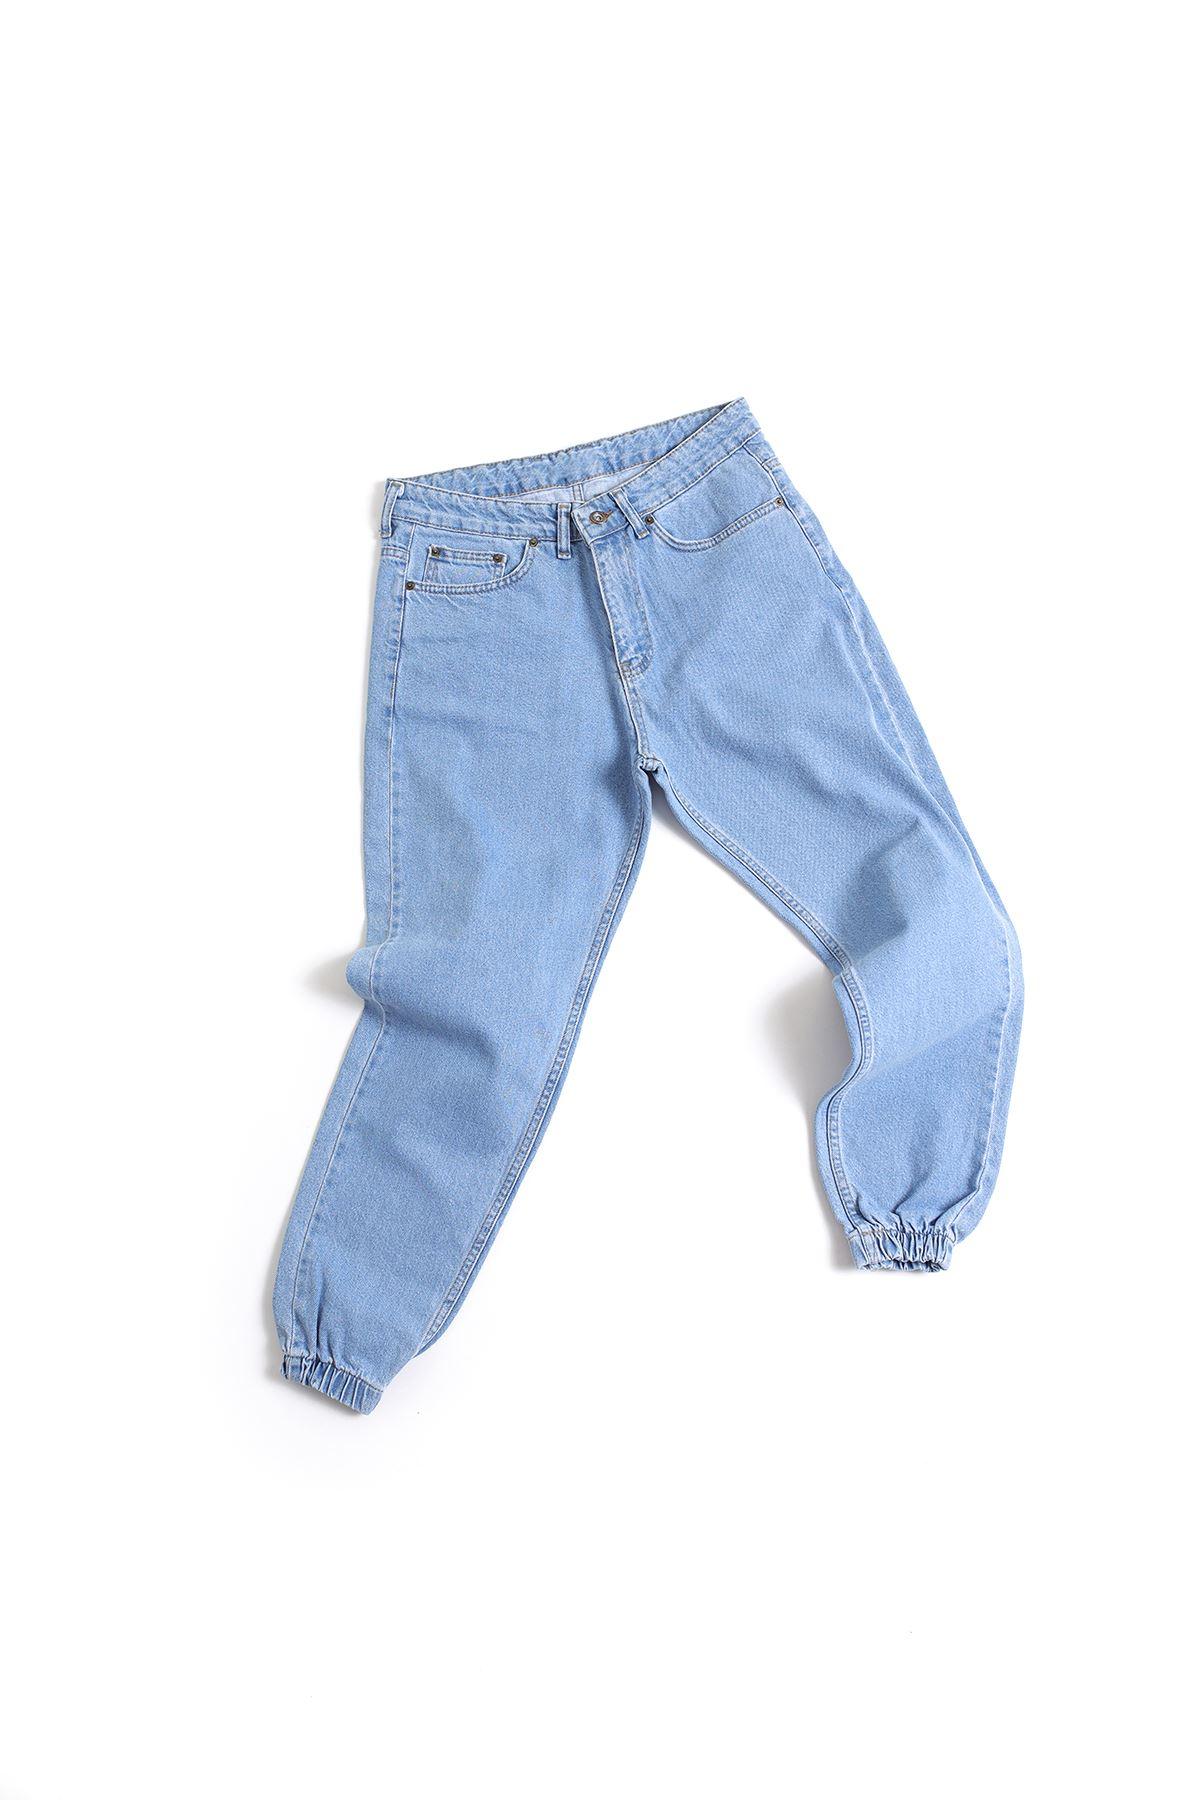 Açık Mavi Boyfriend Kot Pantolon